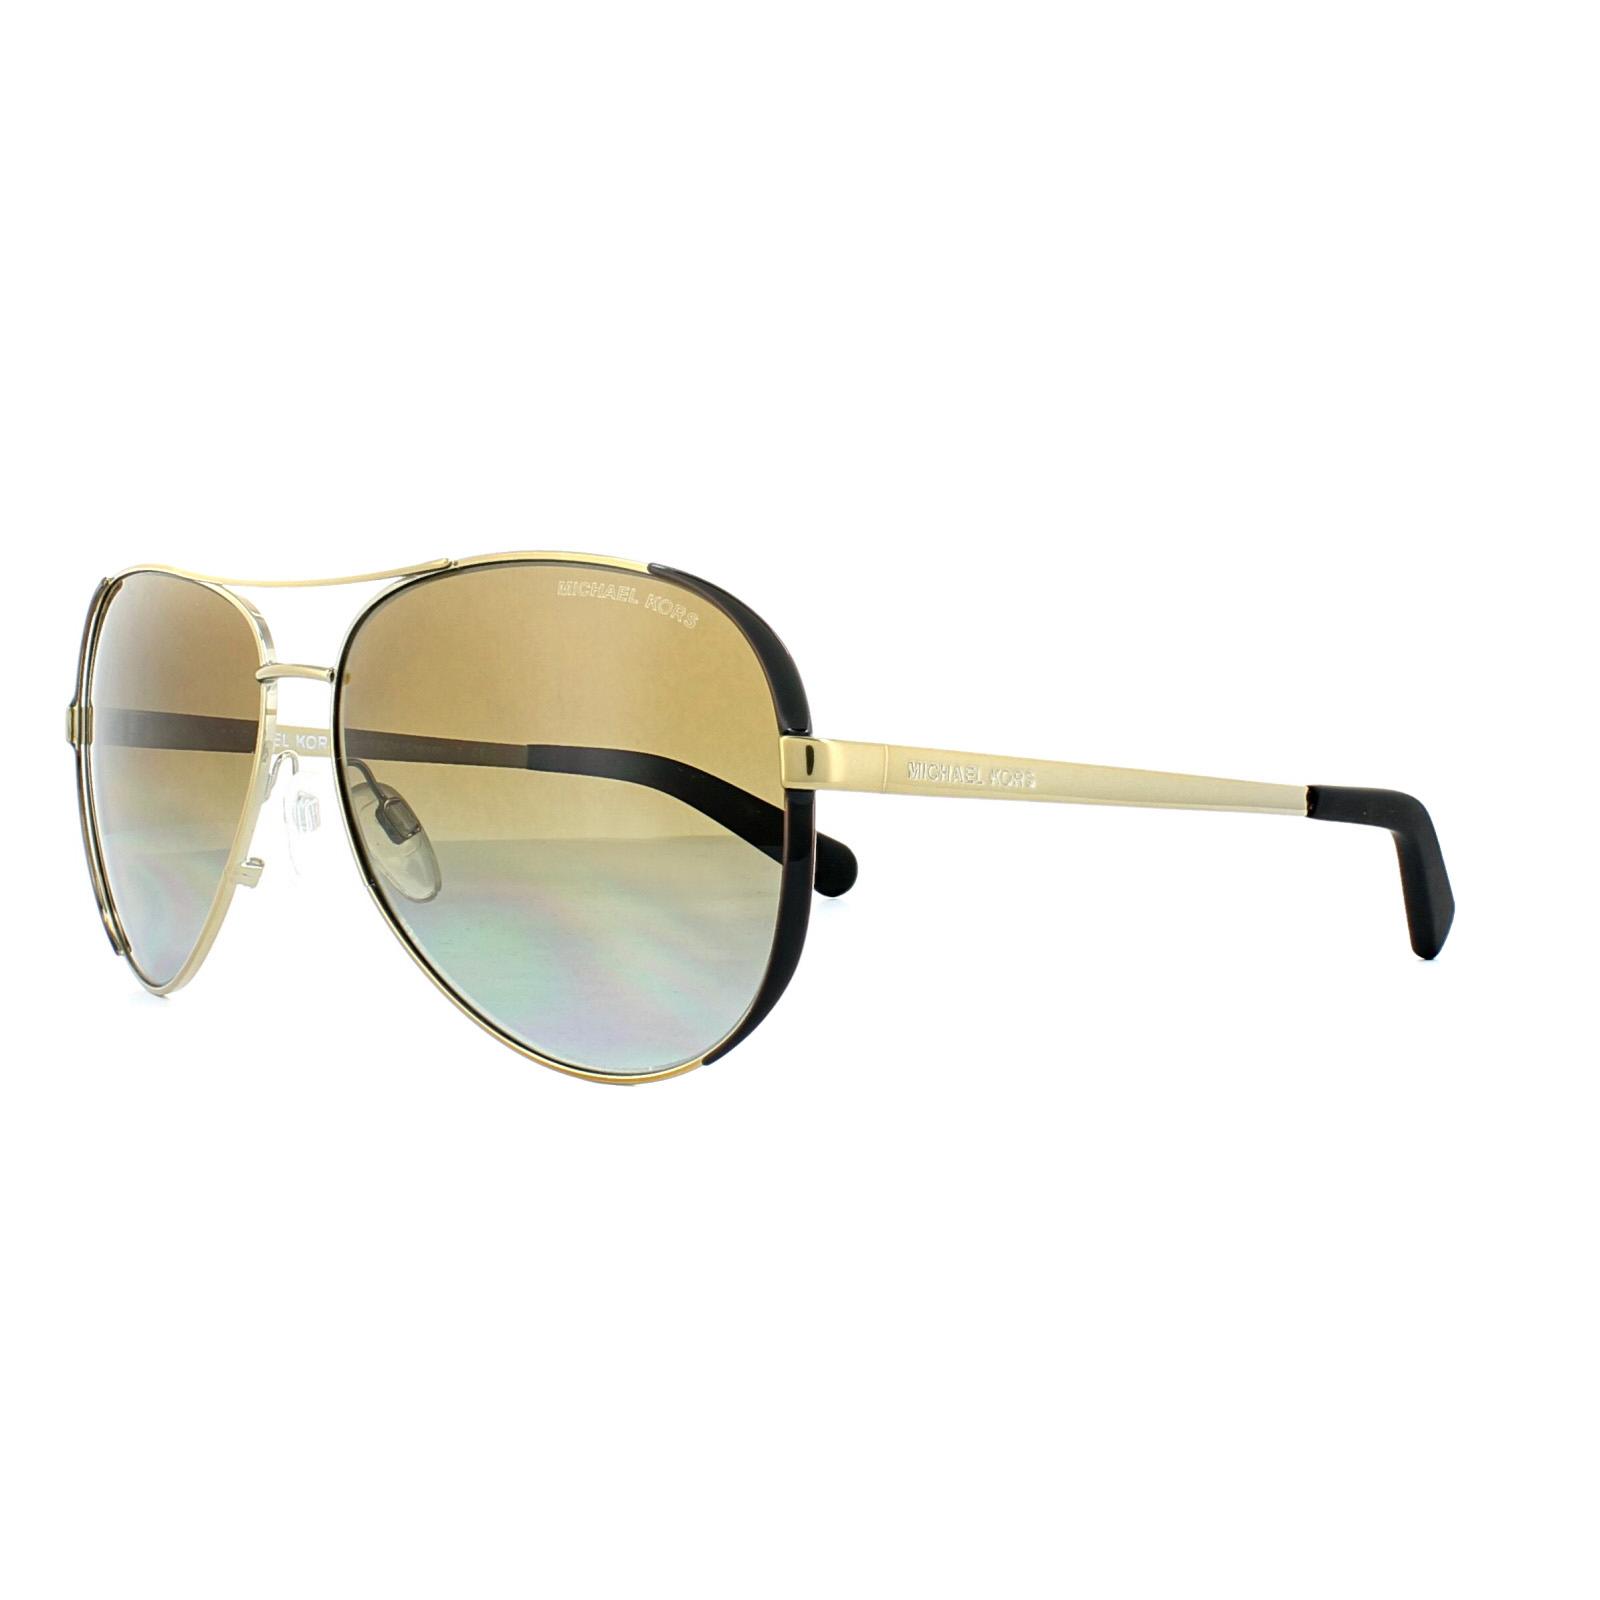 97f711de50913 Sentinel Michael Kors Sunglasses Chelsea 5004 1014 T5 Gold Brown Gradient  Polarized